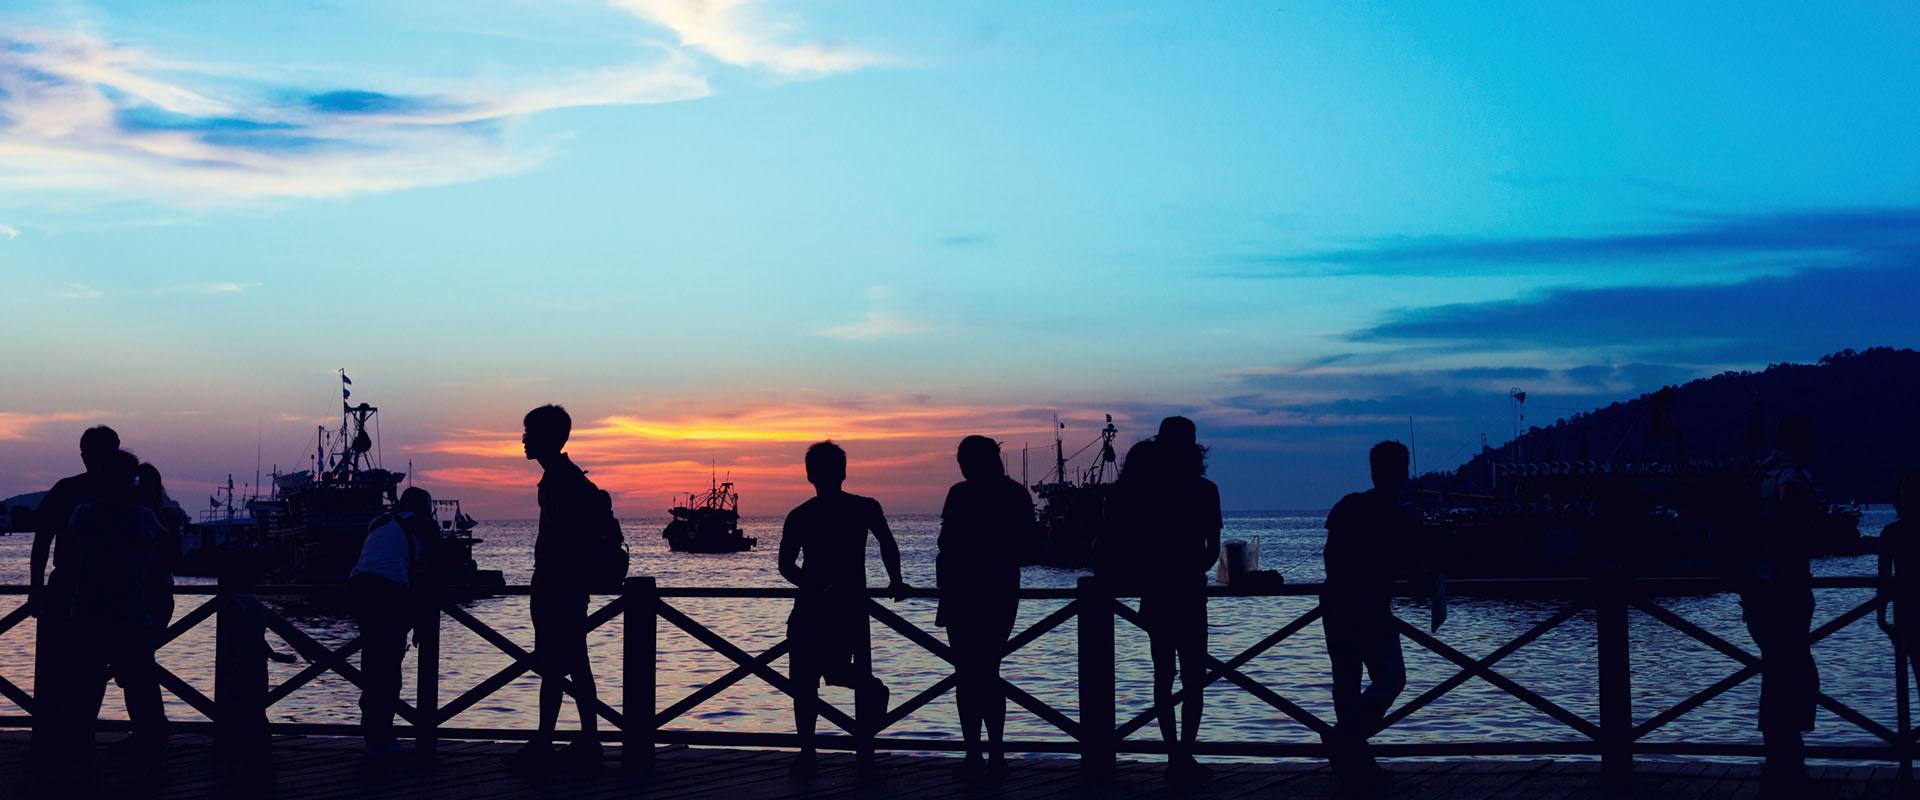 Sabah Public Holidays 2018 Publicholidays Com My